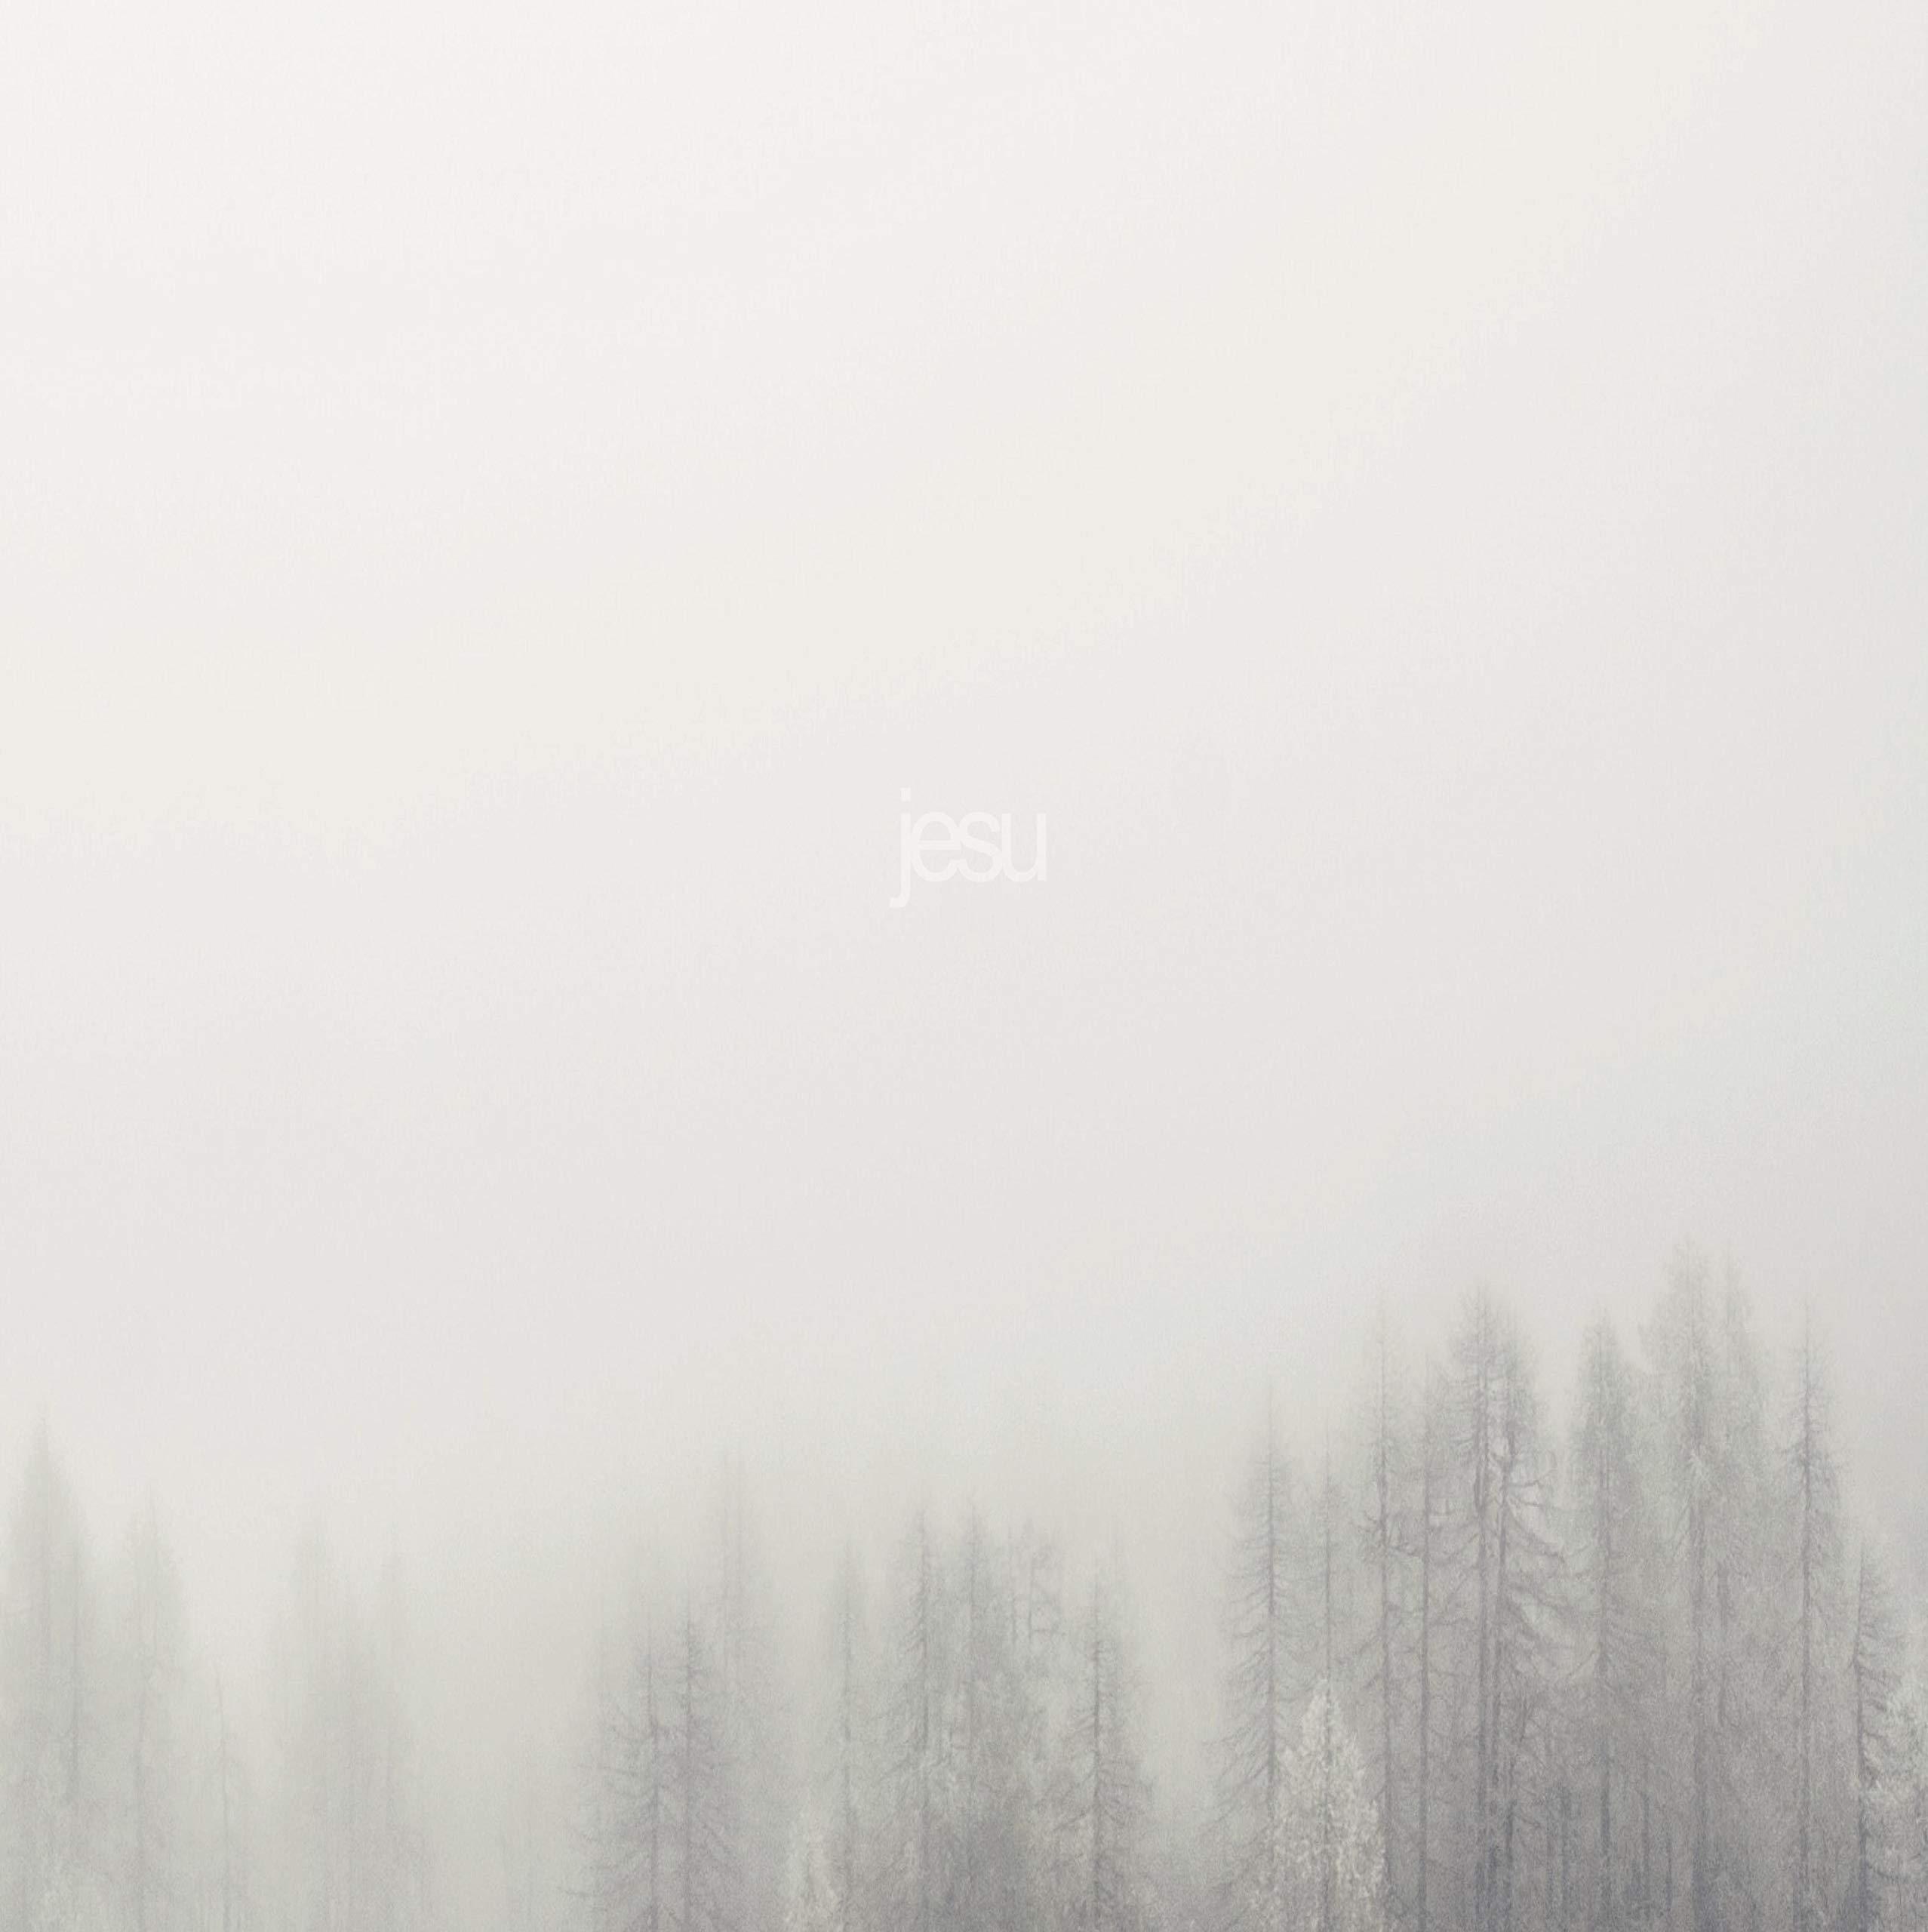 Jesu - Terminus (2020) [FLAC] Download